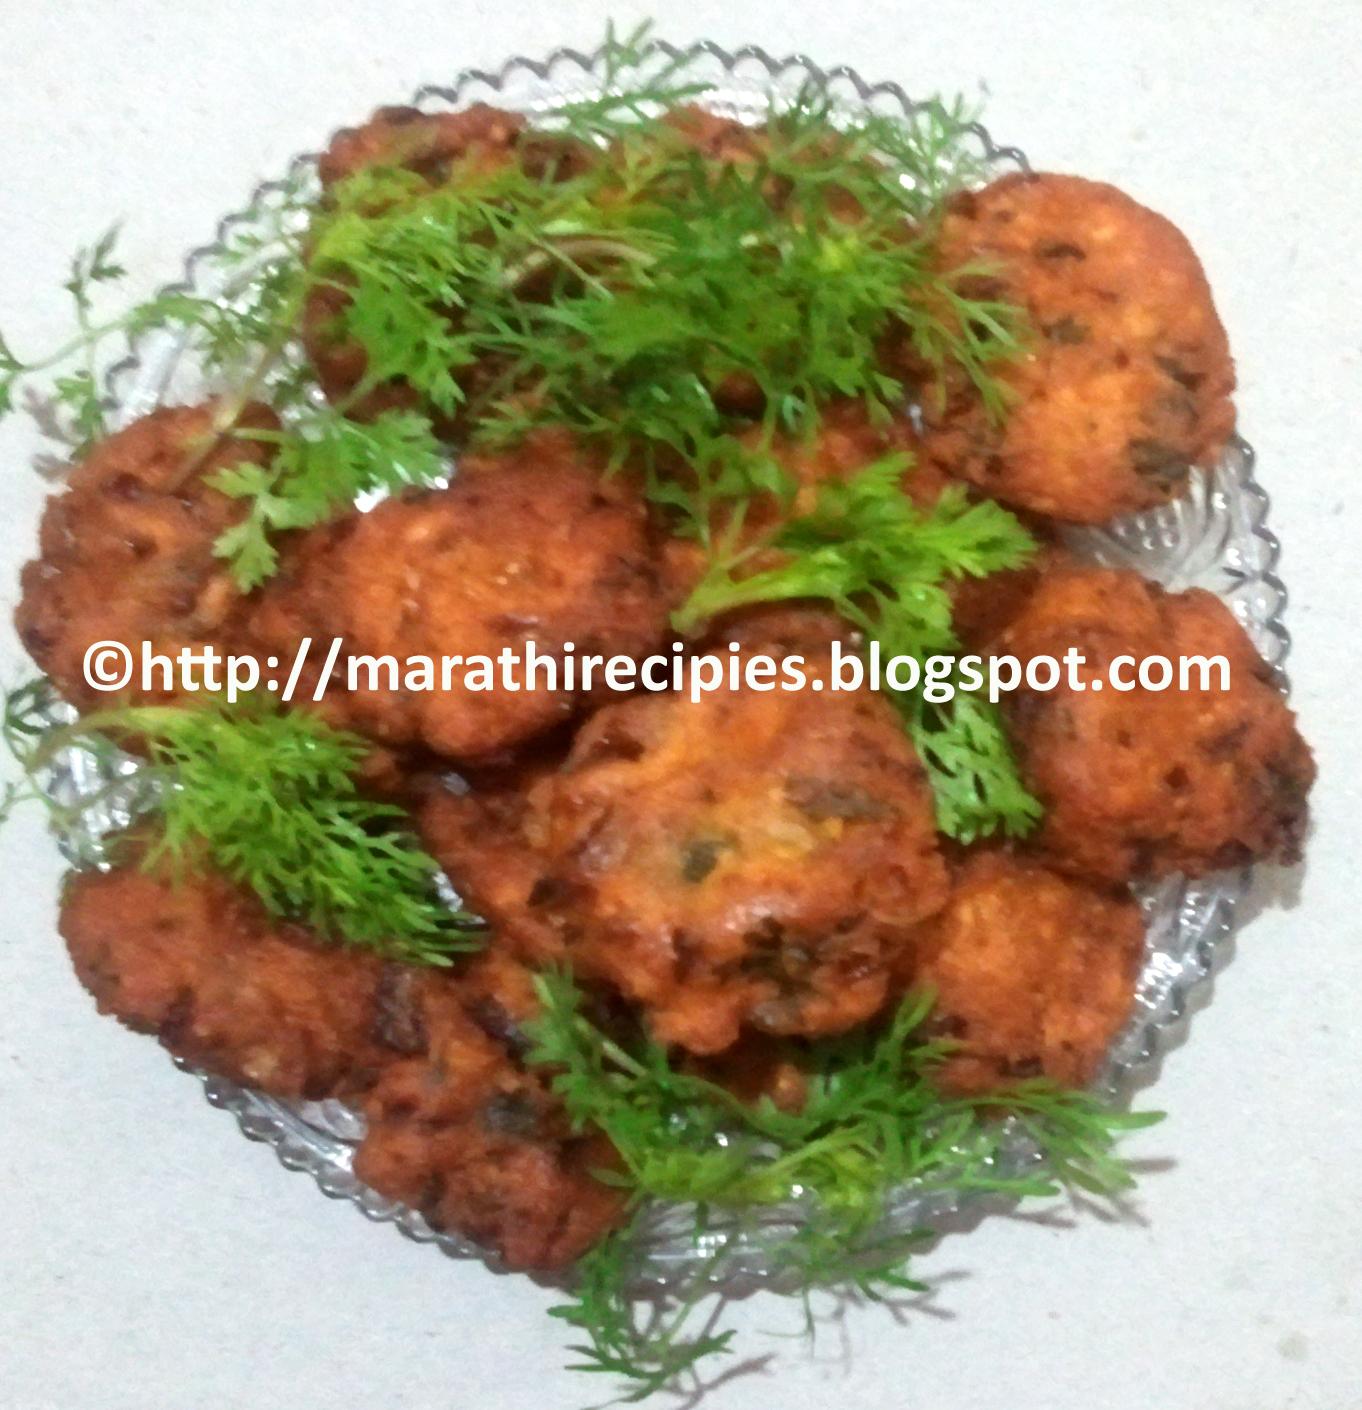 Dal vada recipe | How to make mixed dal vada recipe ...